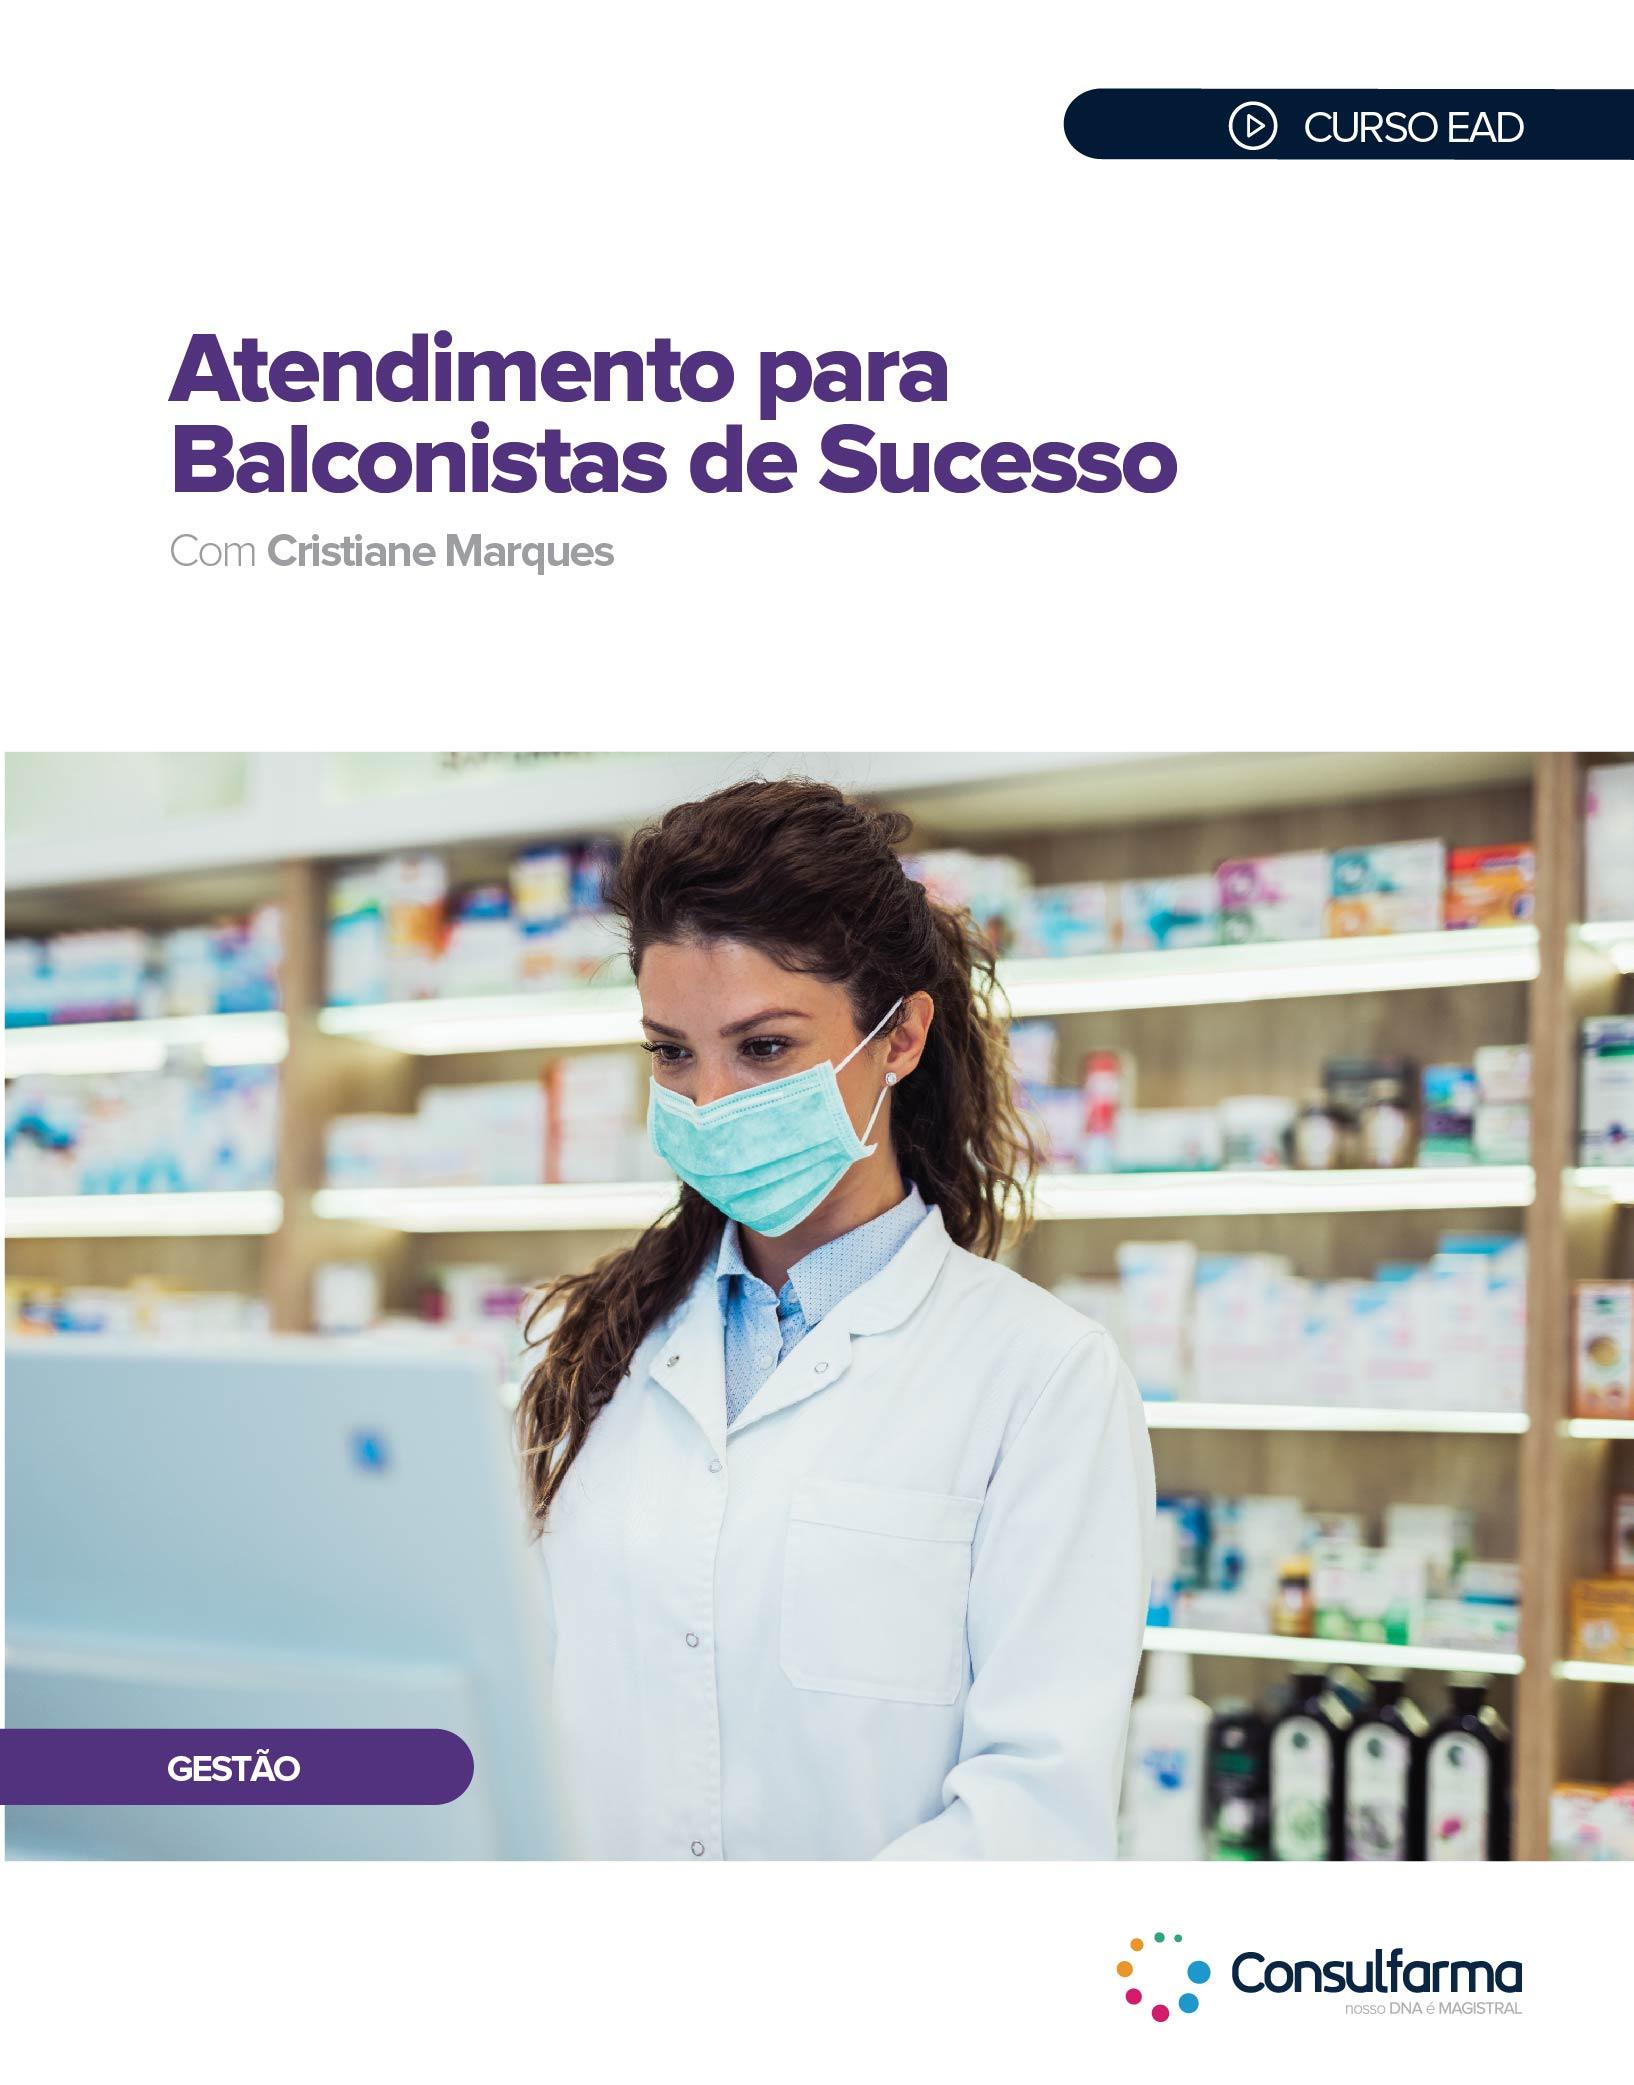 ATENDIMENTO PARA BALCONISTAS DE SUCESSO 2.0